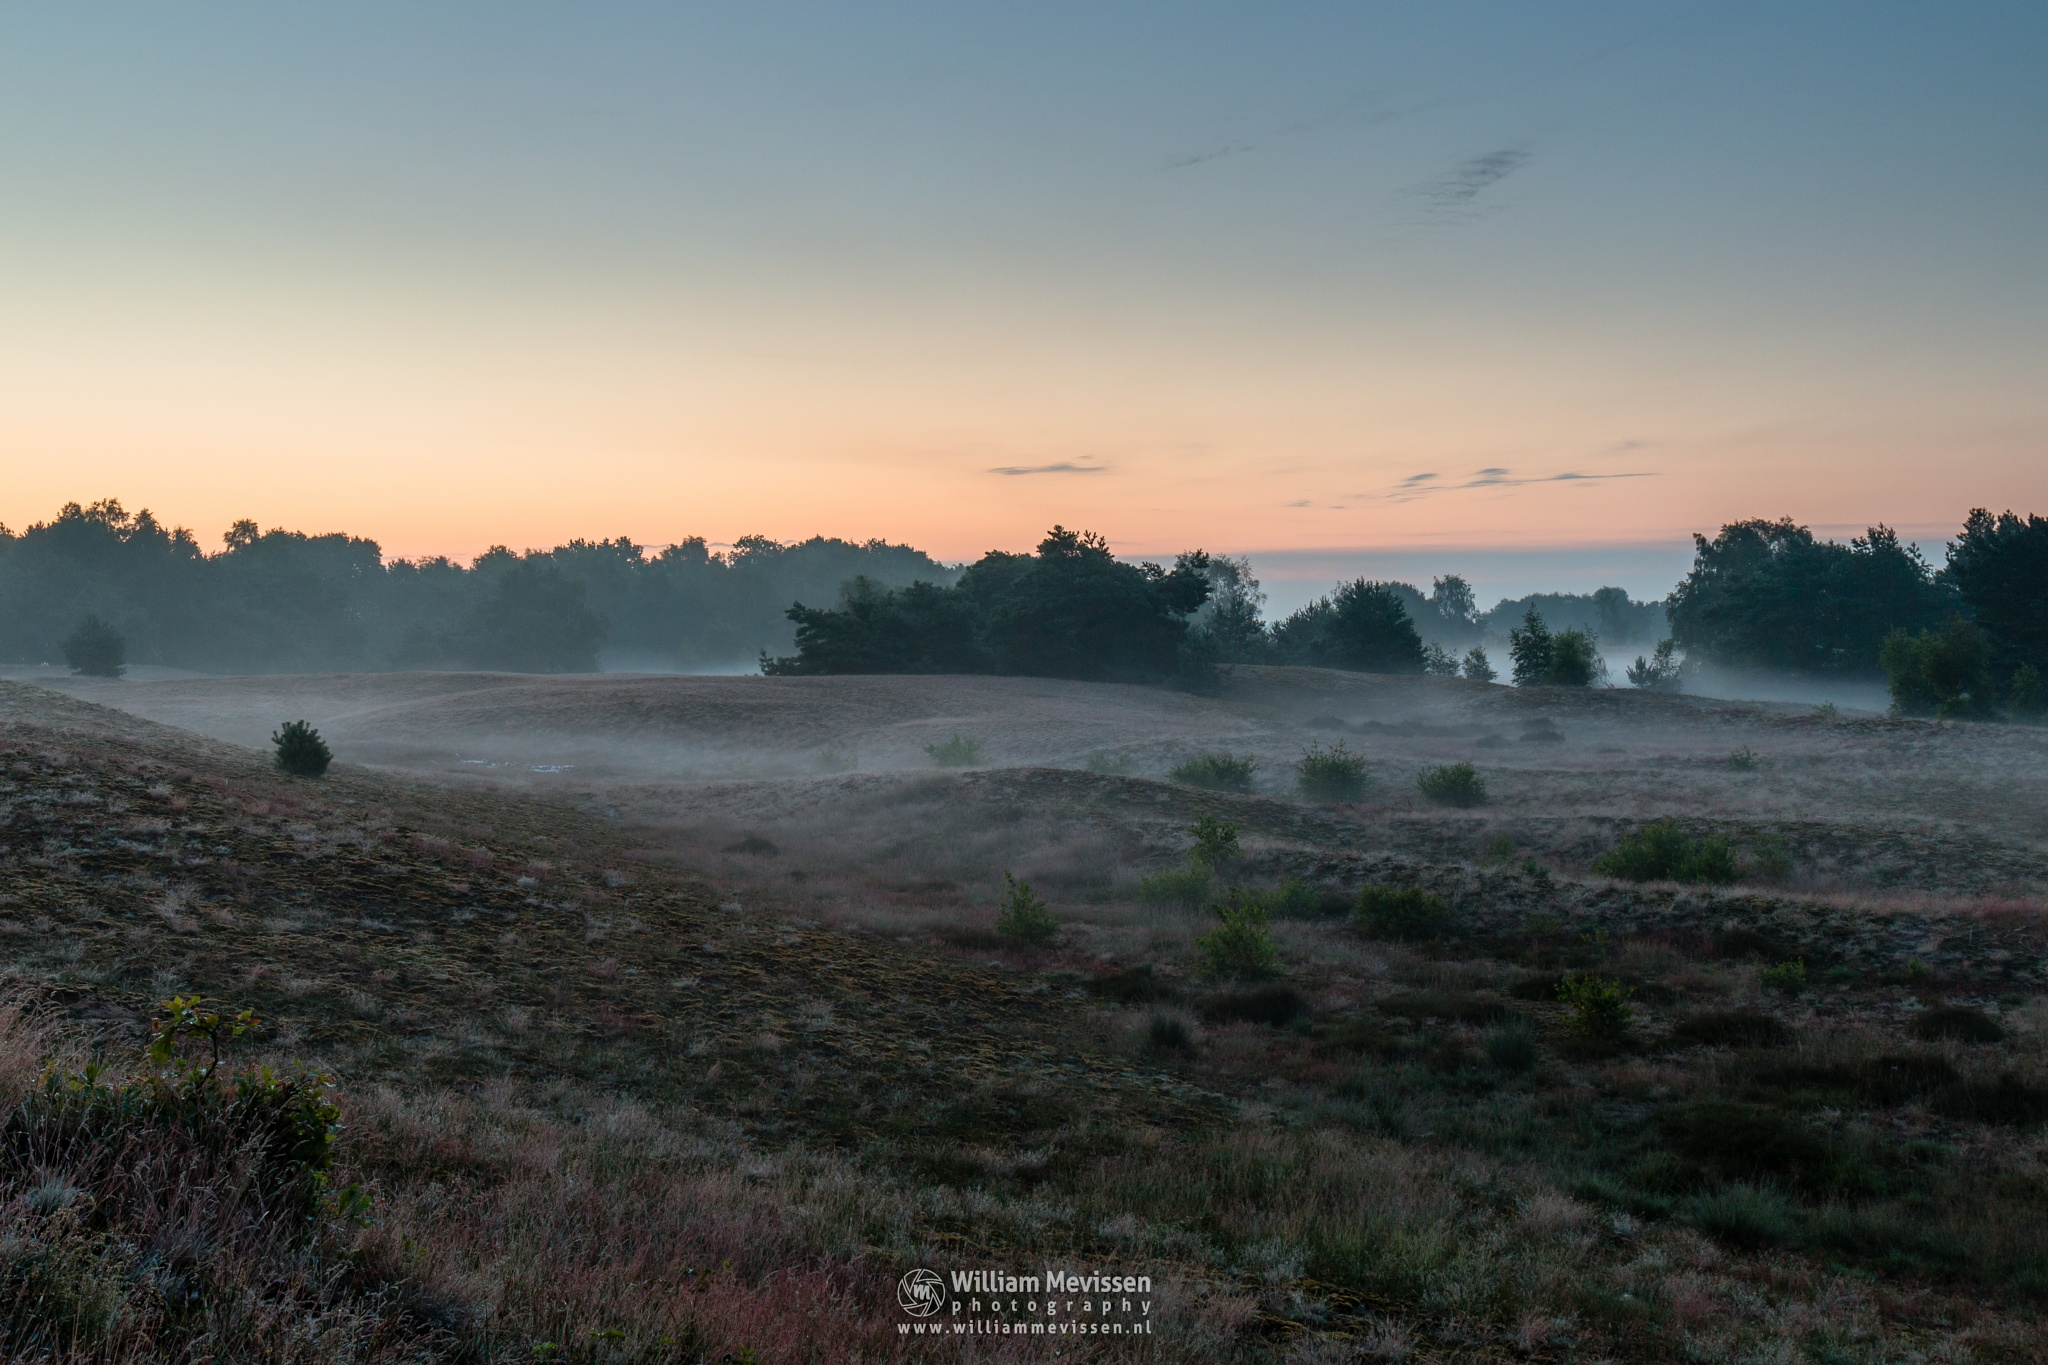 A Touch Of Mist by William Mevissen